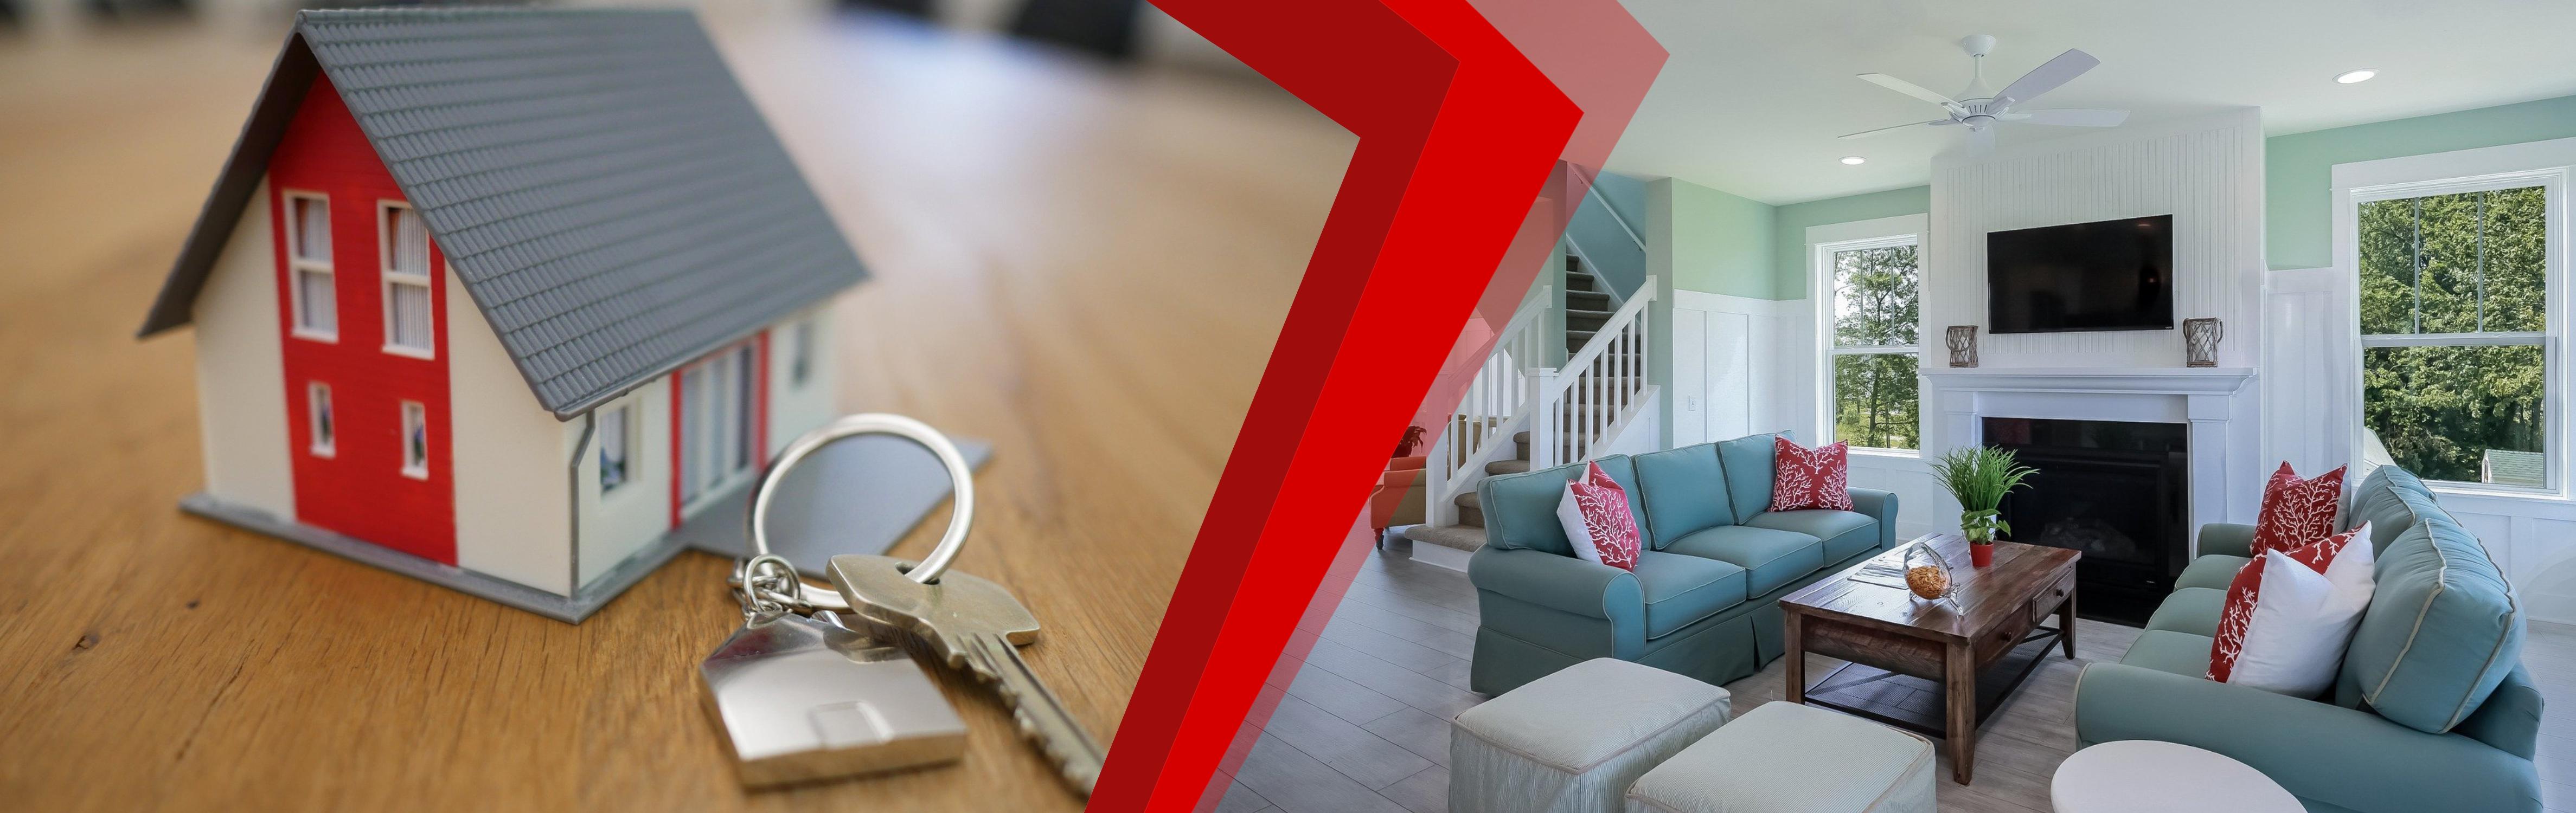 servizi vendita immobiliari immobilpoint